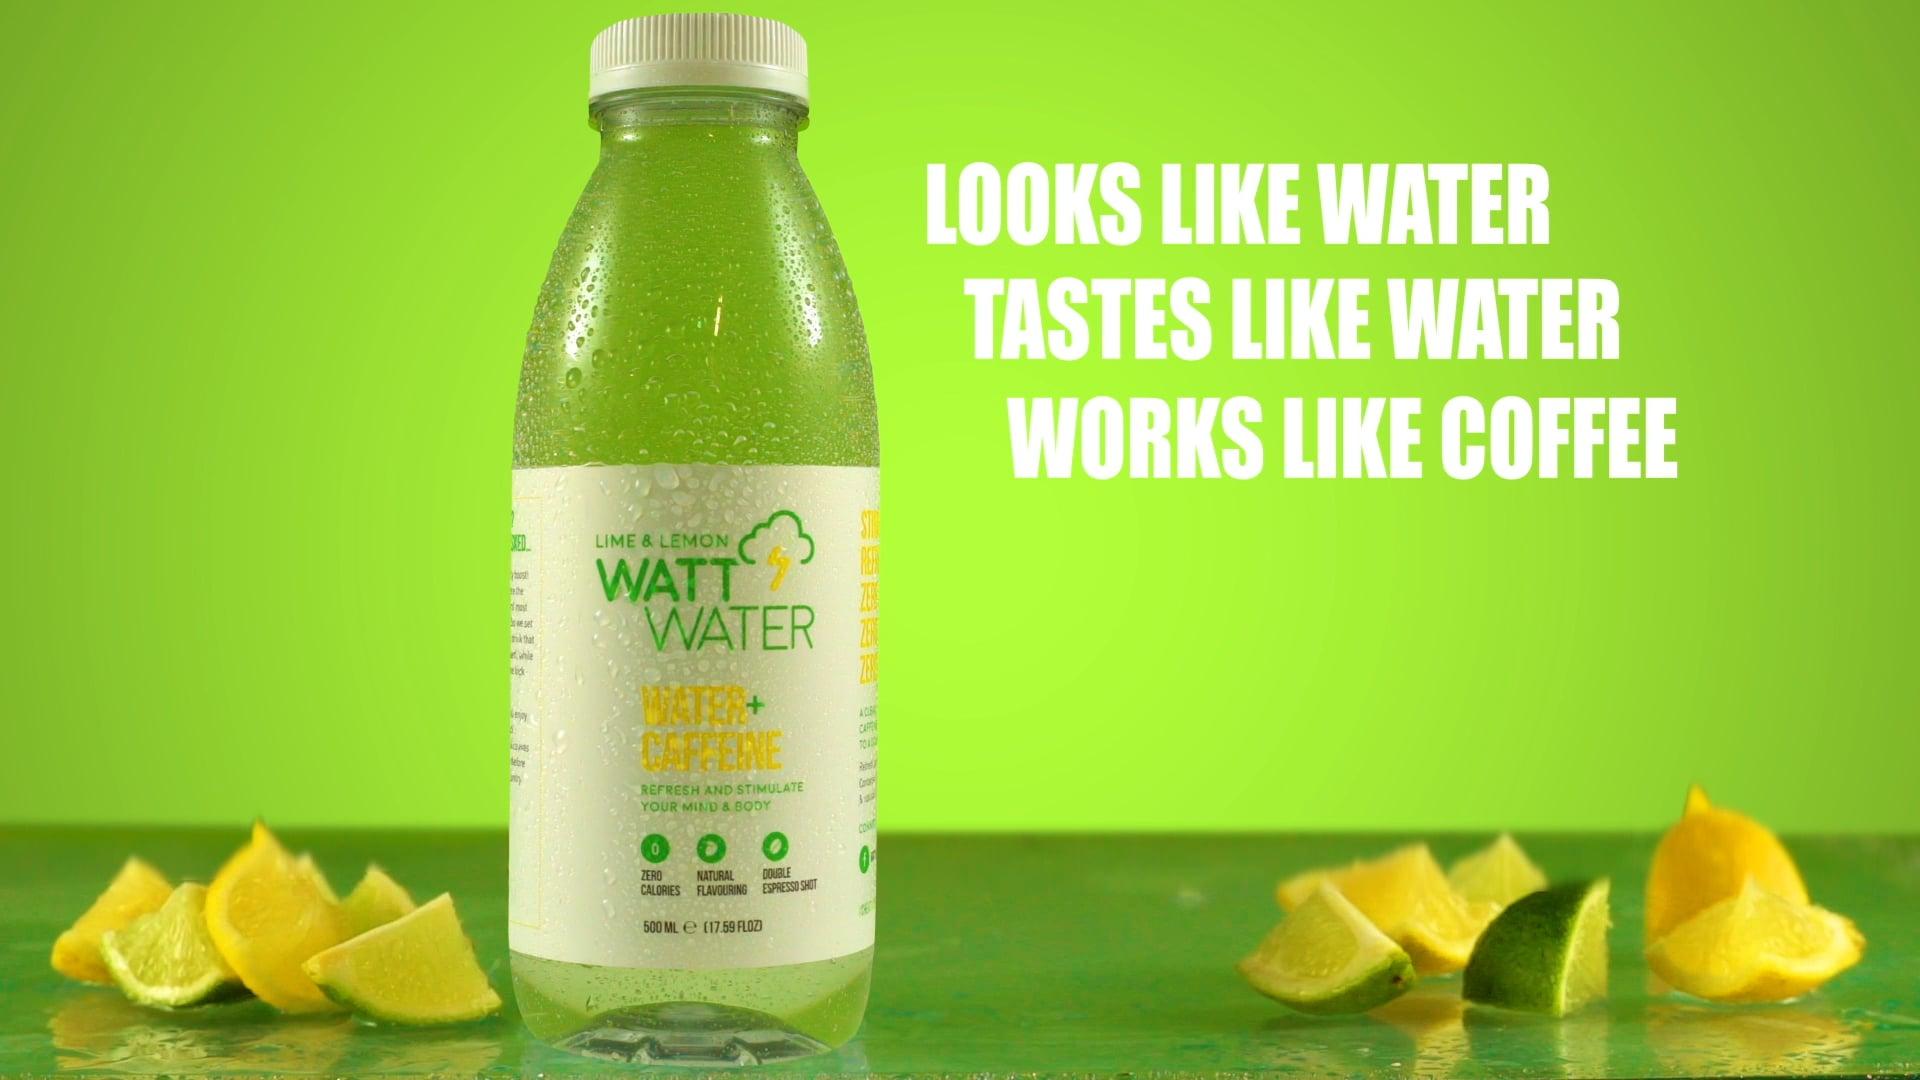 Watt Water - Lemon and Lime Ad